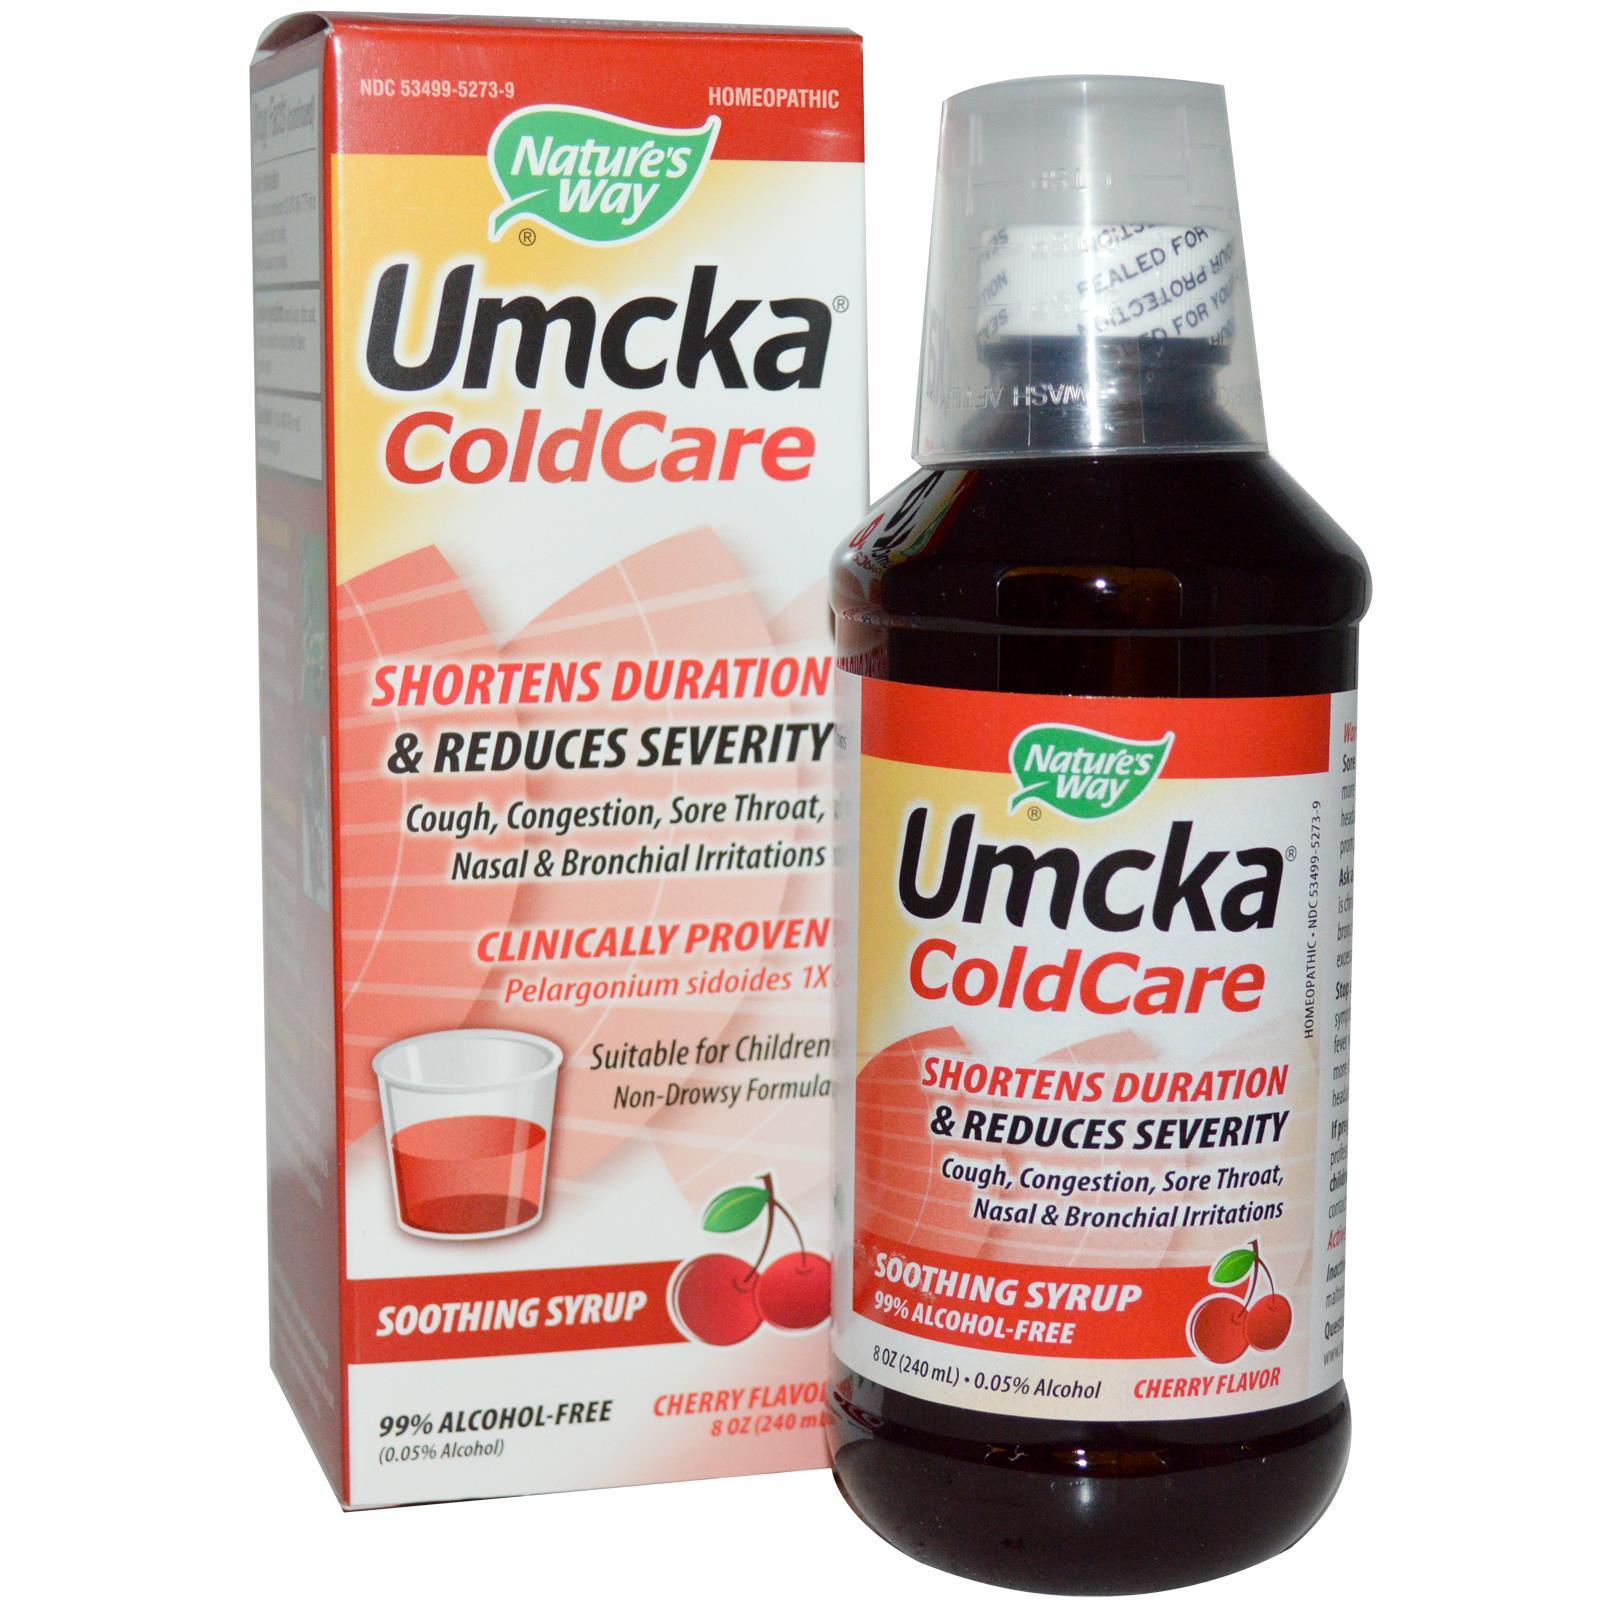 Nature's Way Umcka ColdCare Syrup Cherry (8 fl Oz)